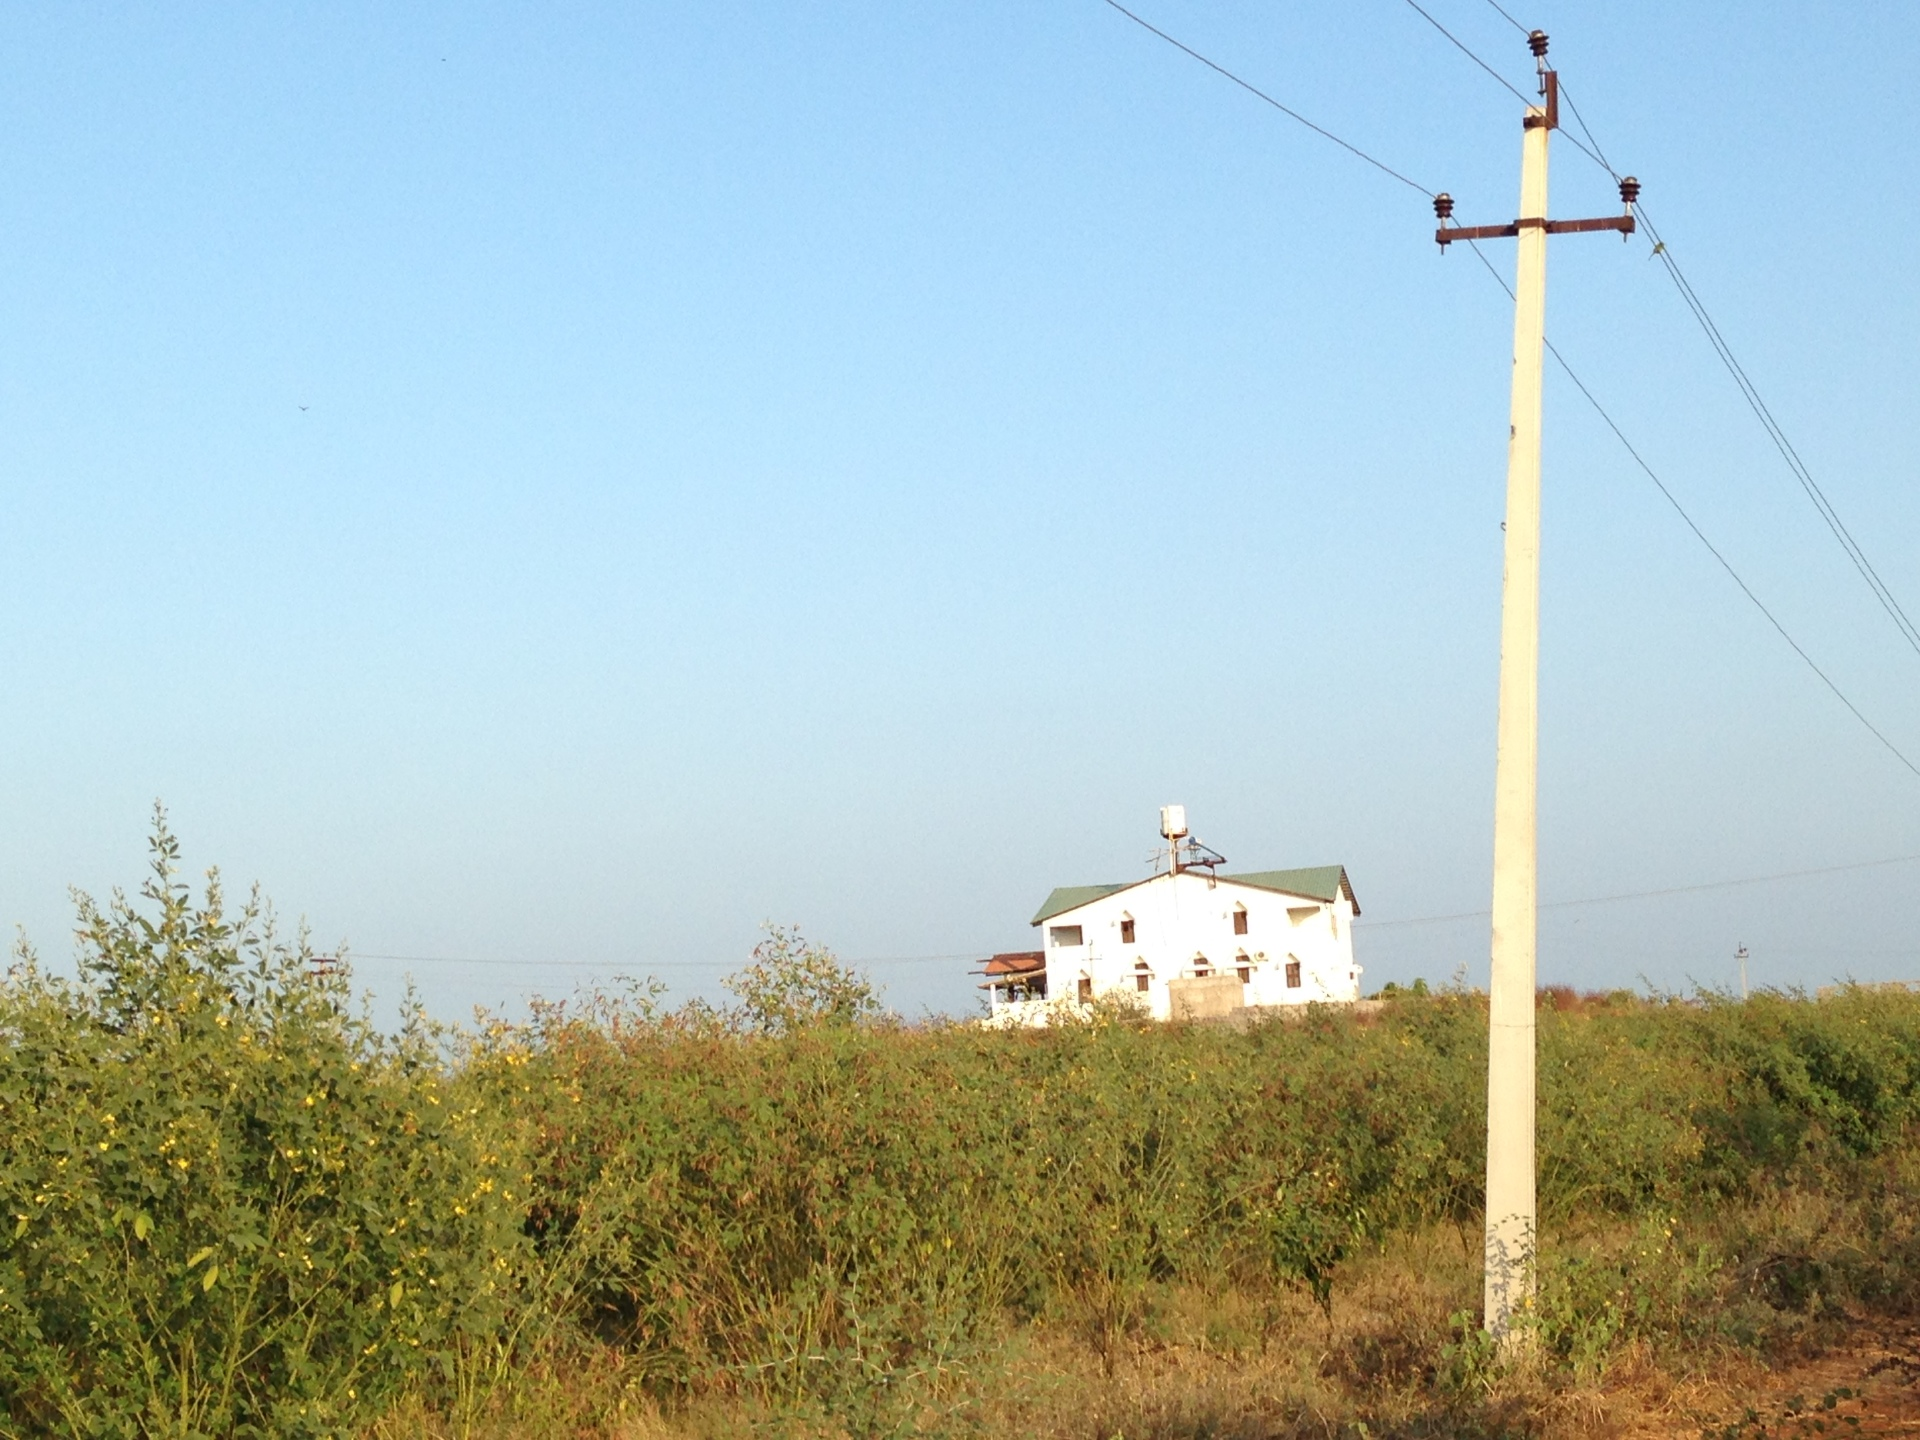 Raghumohan Kaka's farm house